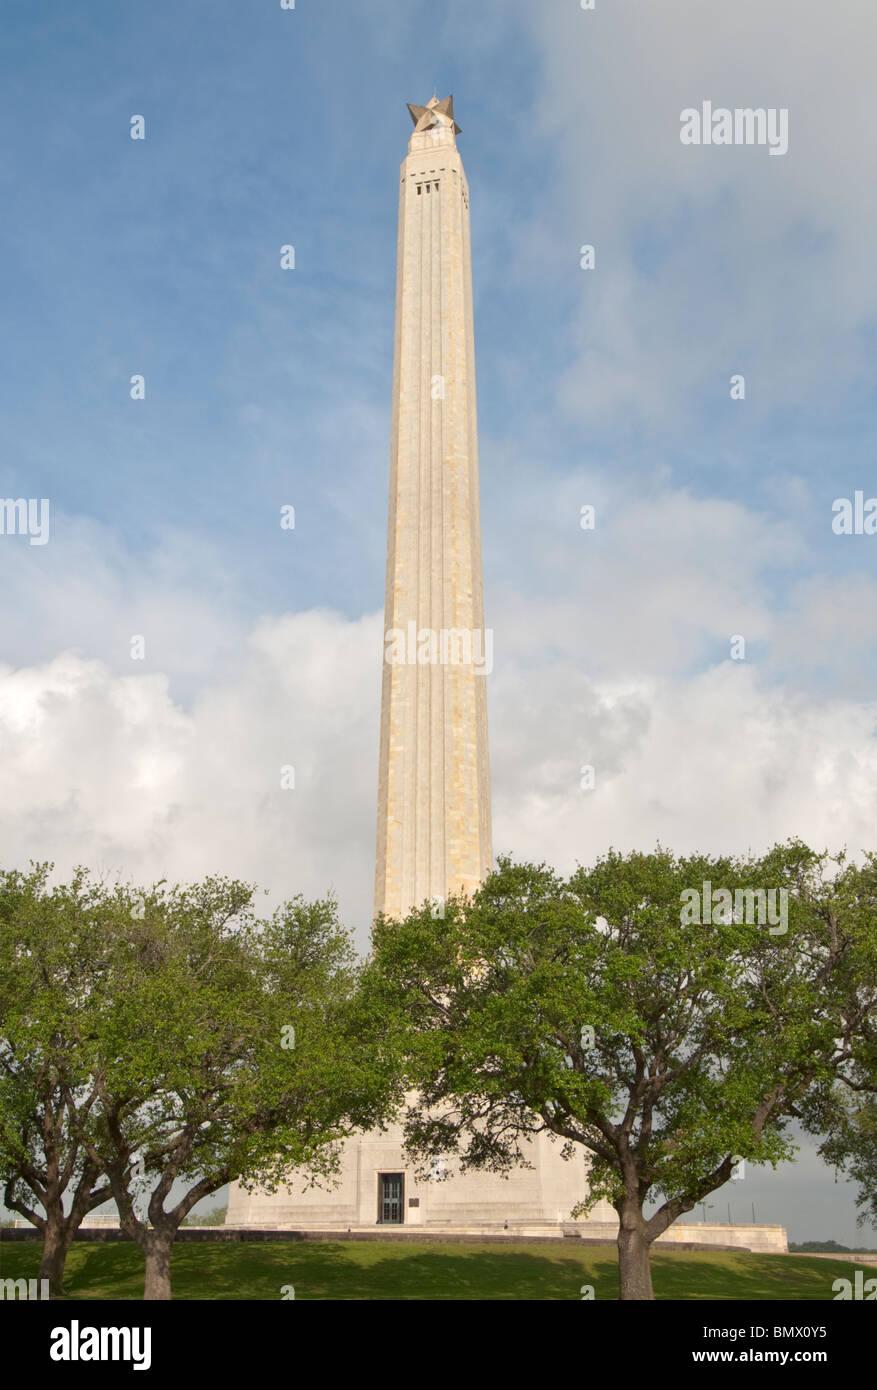 Texas, La Porte, San Jacinto Battleground State Historic Site, San Jacinto Monument, 570 feet tall - Stock Image